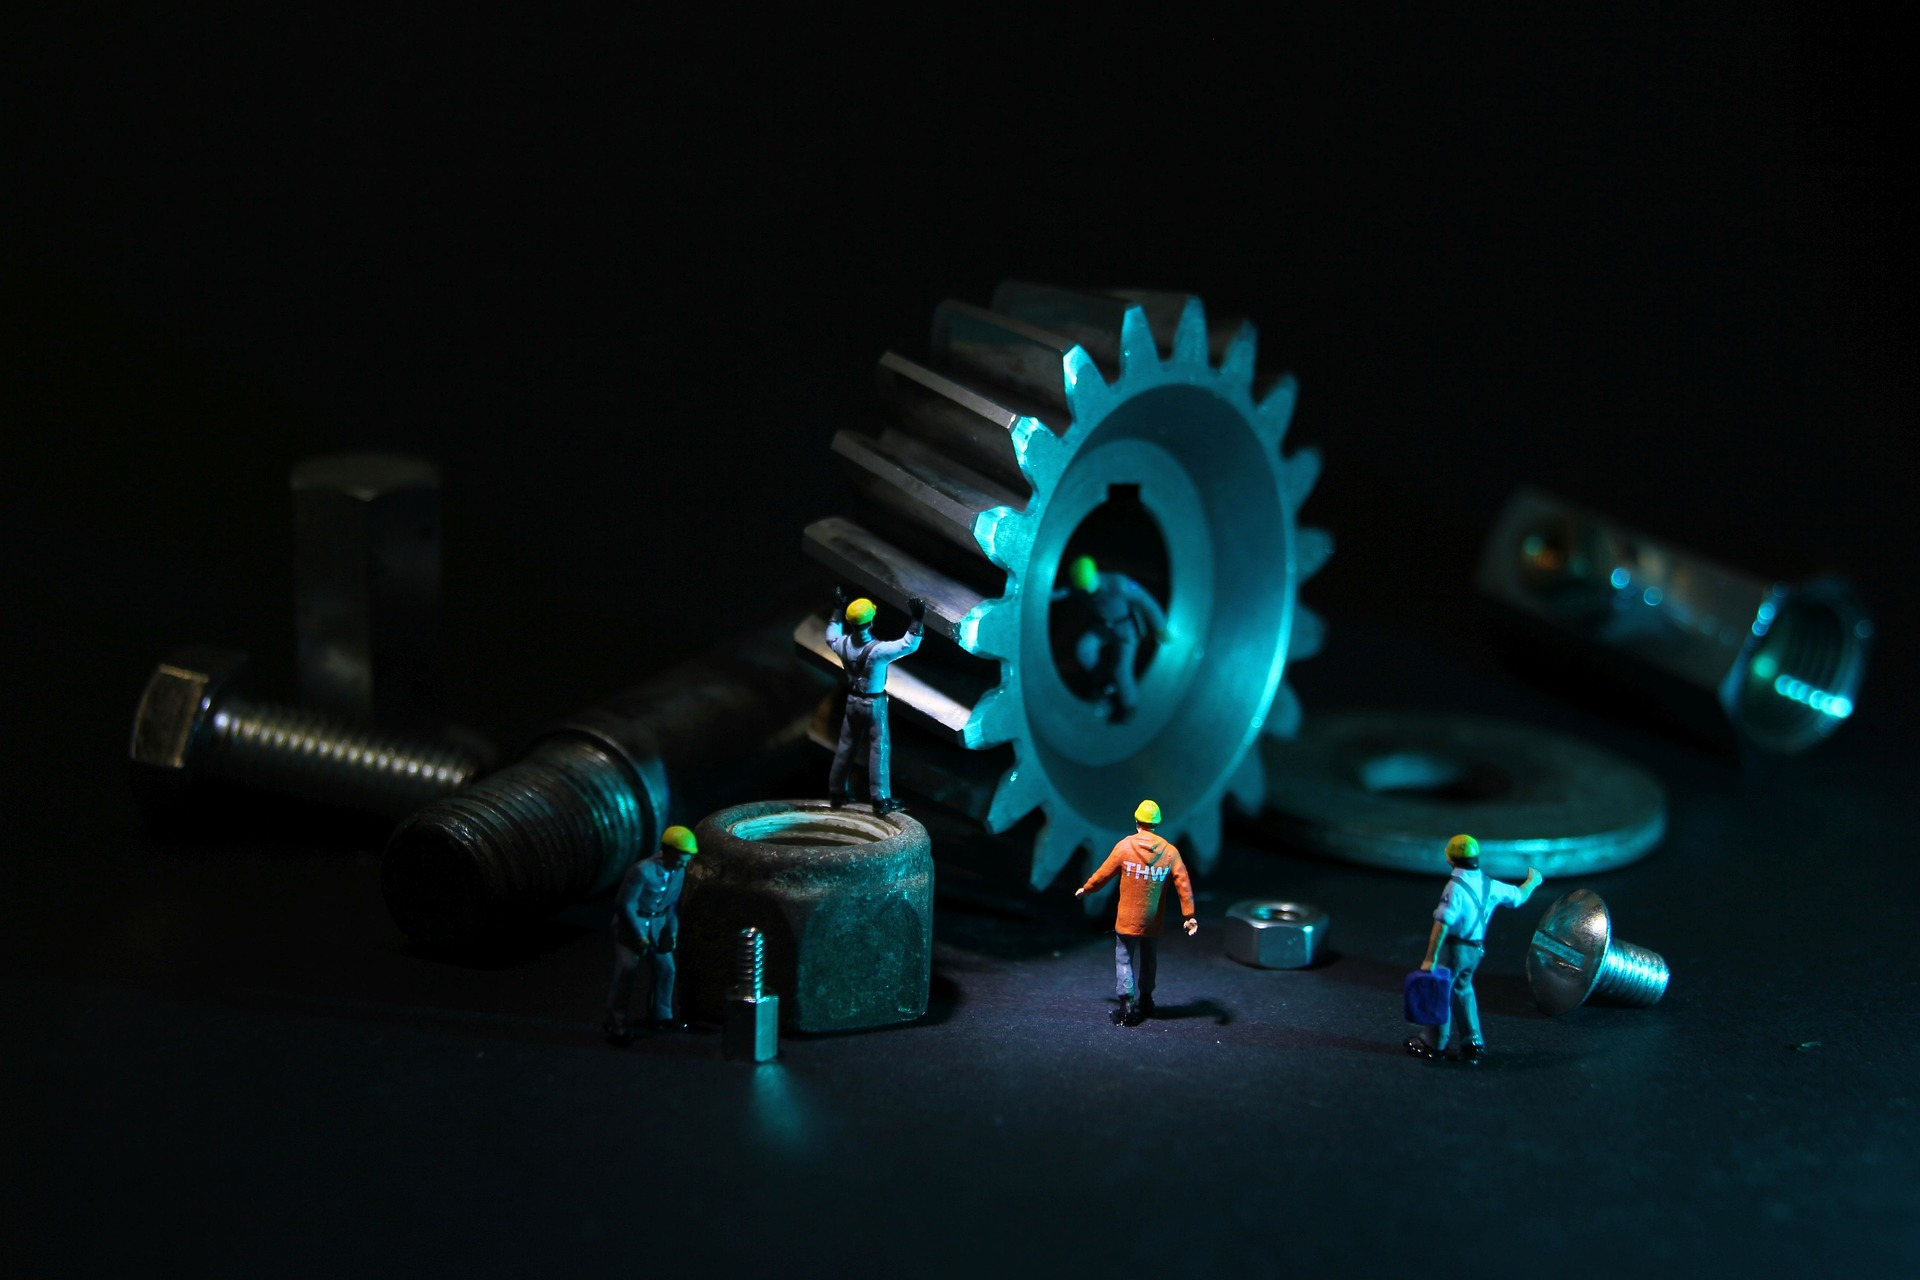 mechanical-engineering-2993233_1920